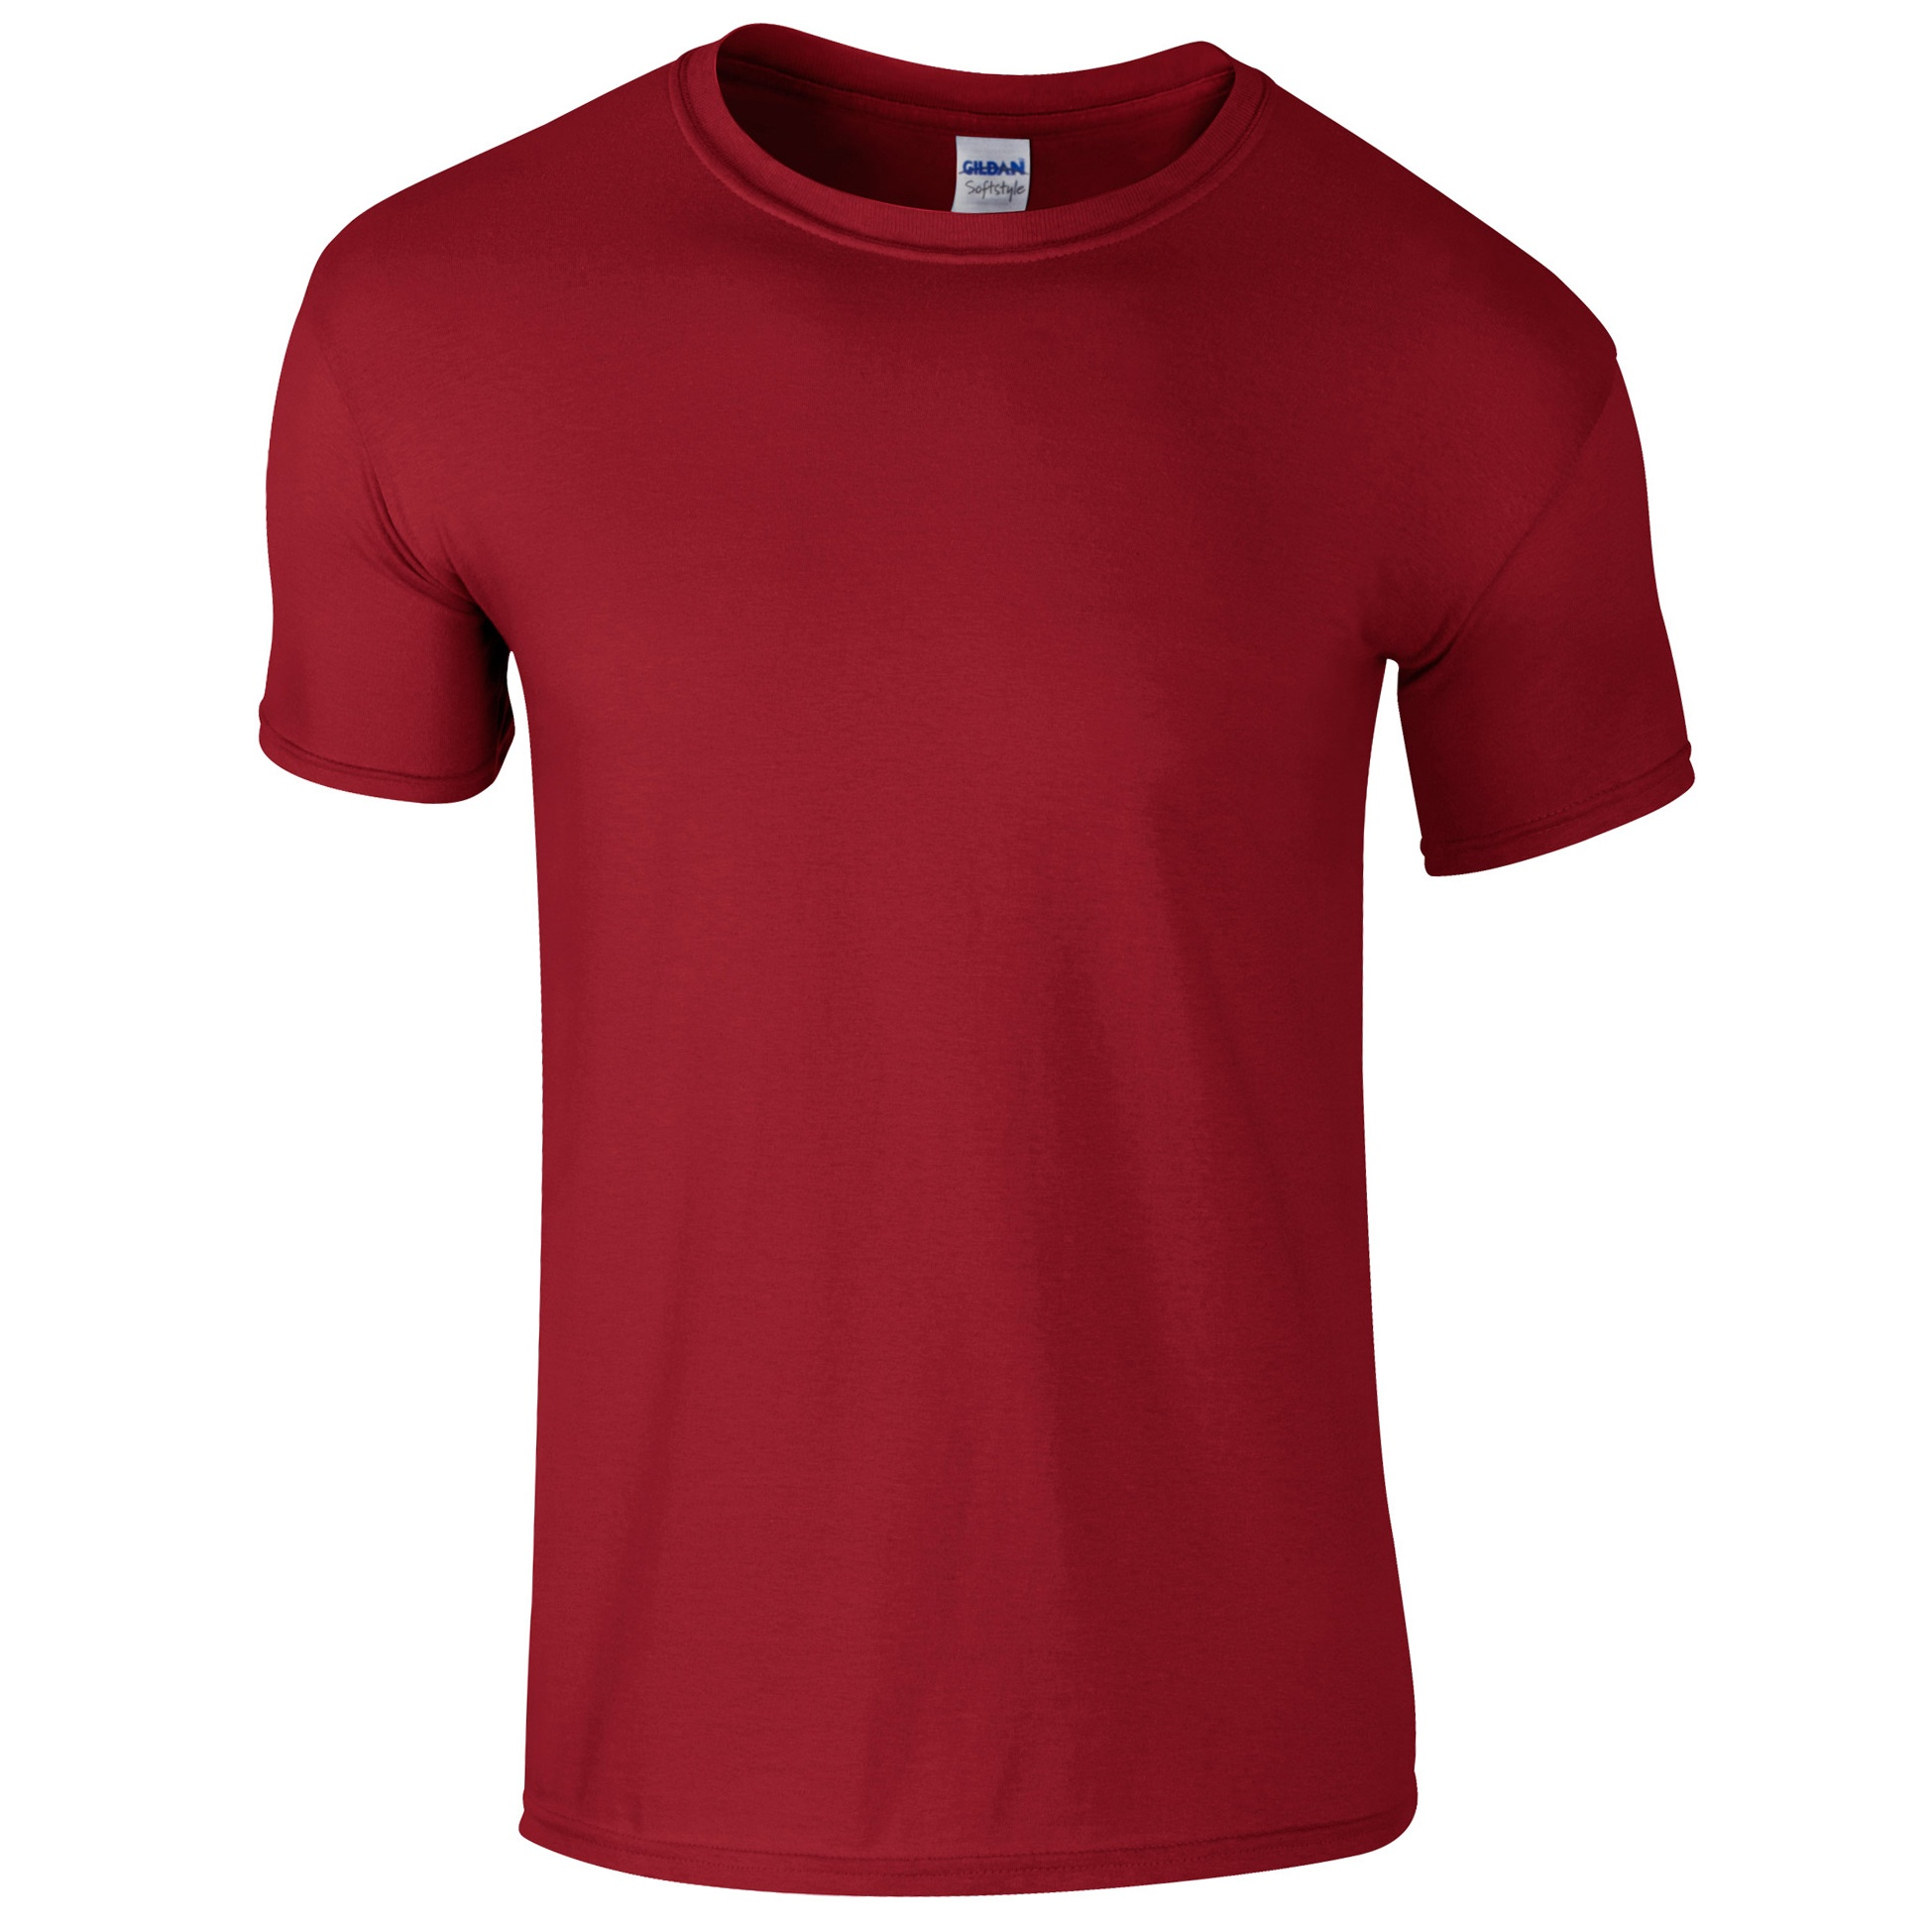 Gildan Mens Short Sleeve Soft-Style T-Shirt (L) (Cardinal)